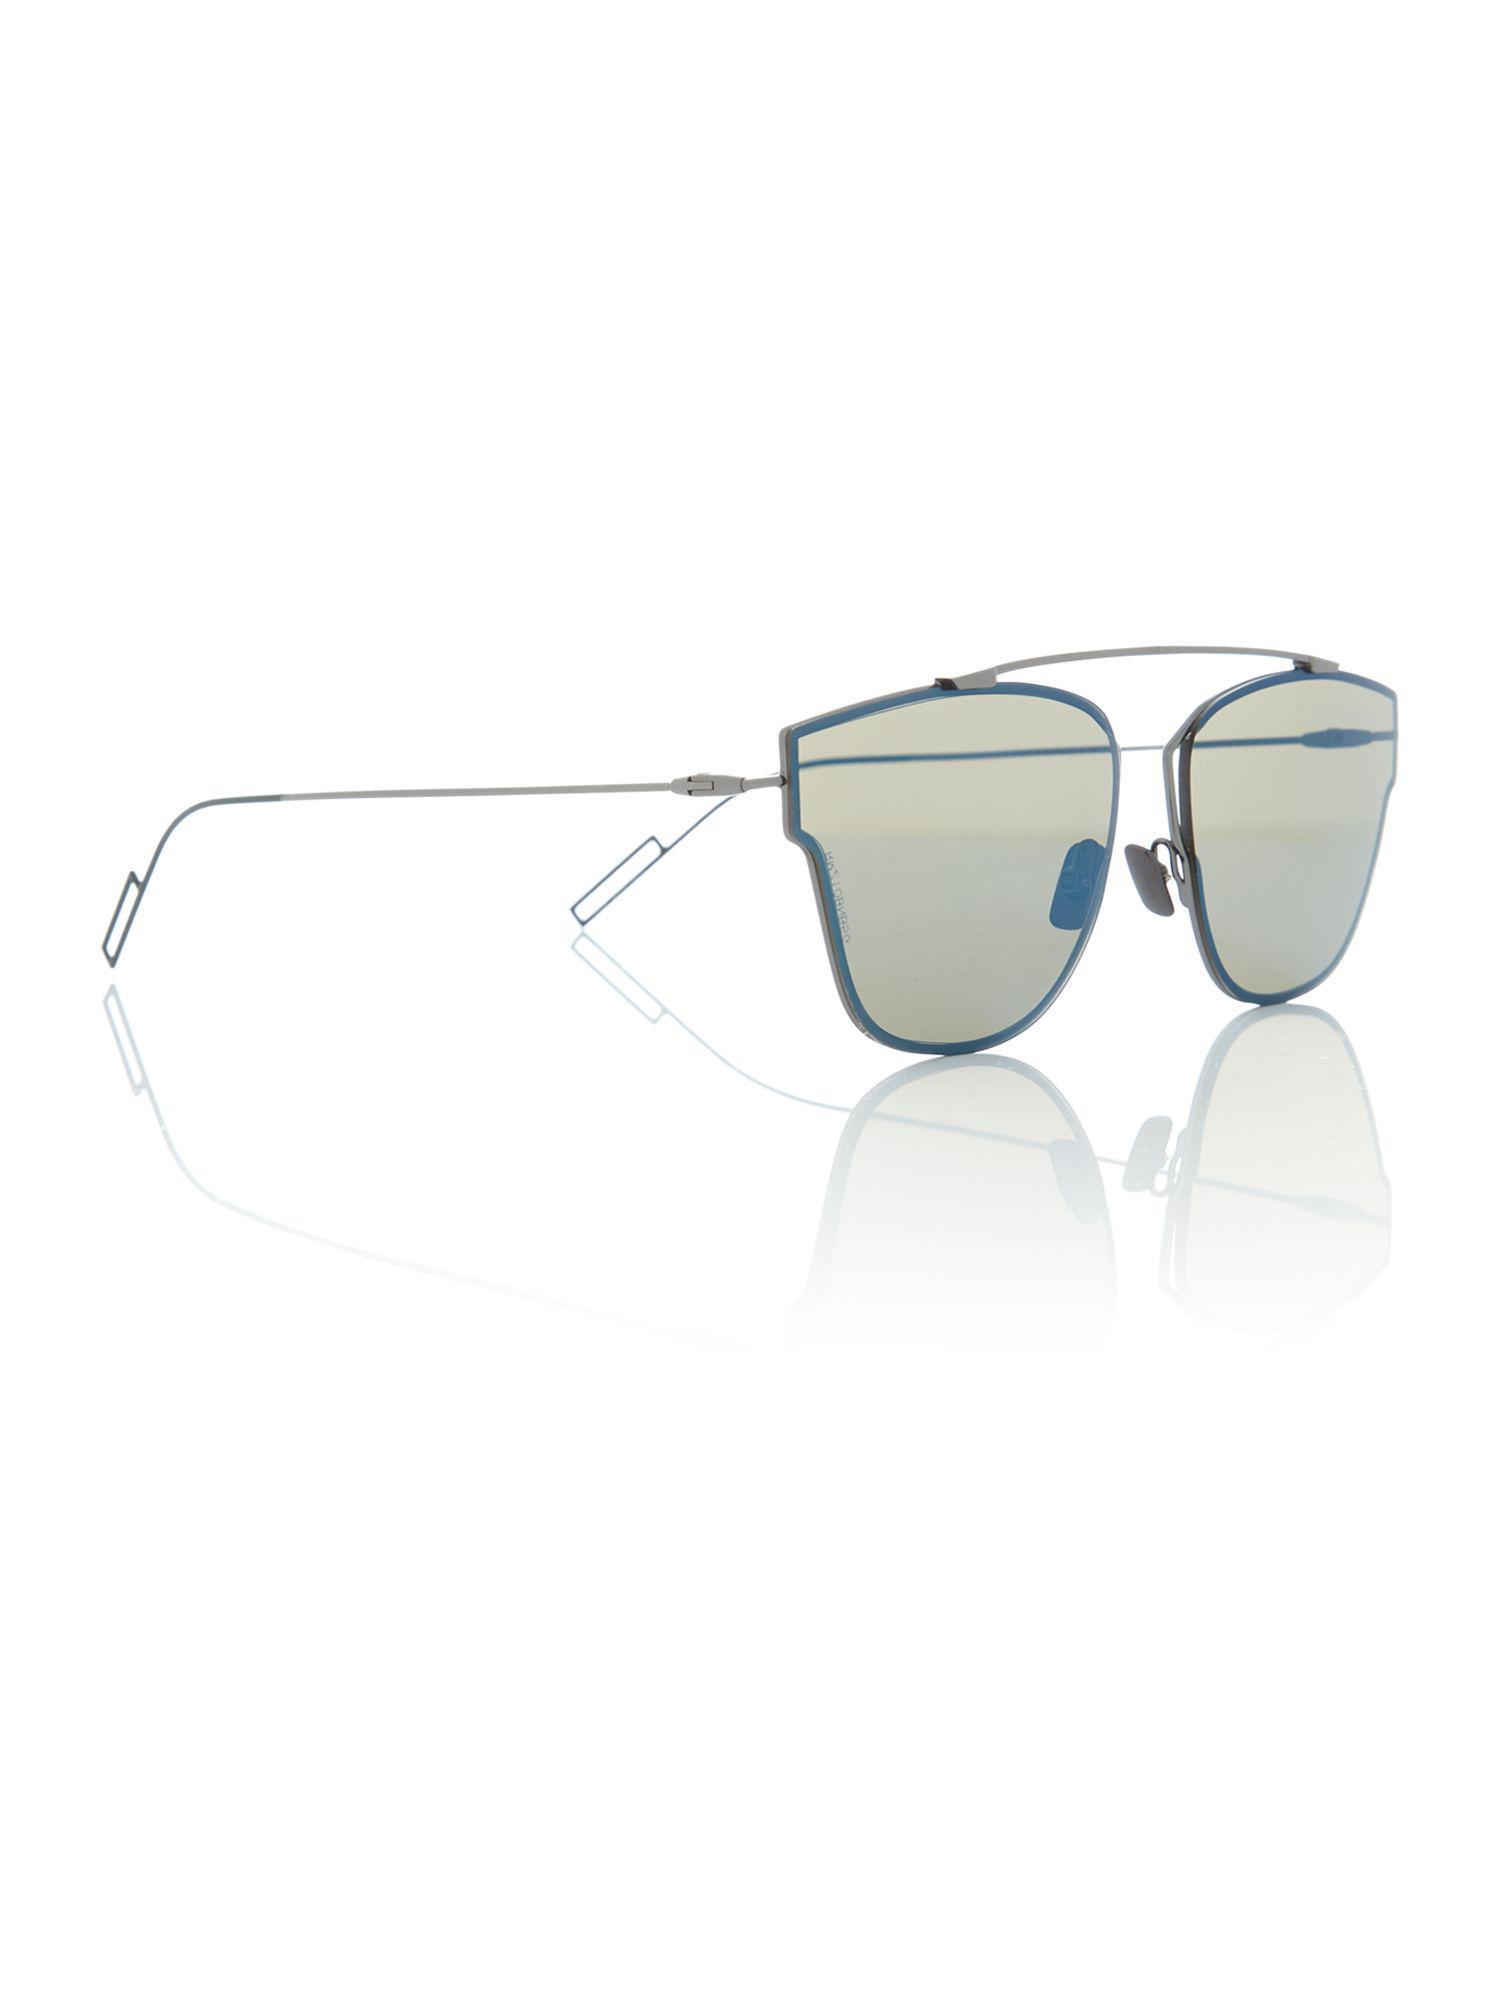 Dior. Men's Blue Cd 0204s Pilot Sunglasses